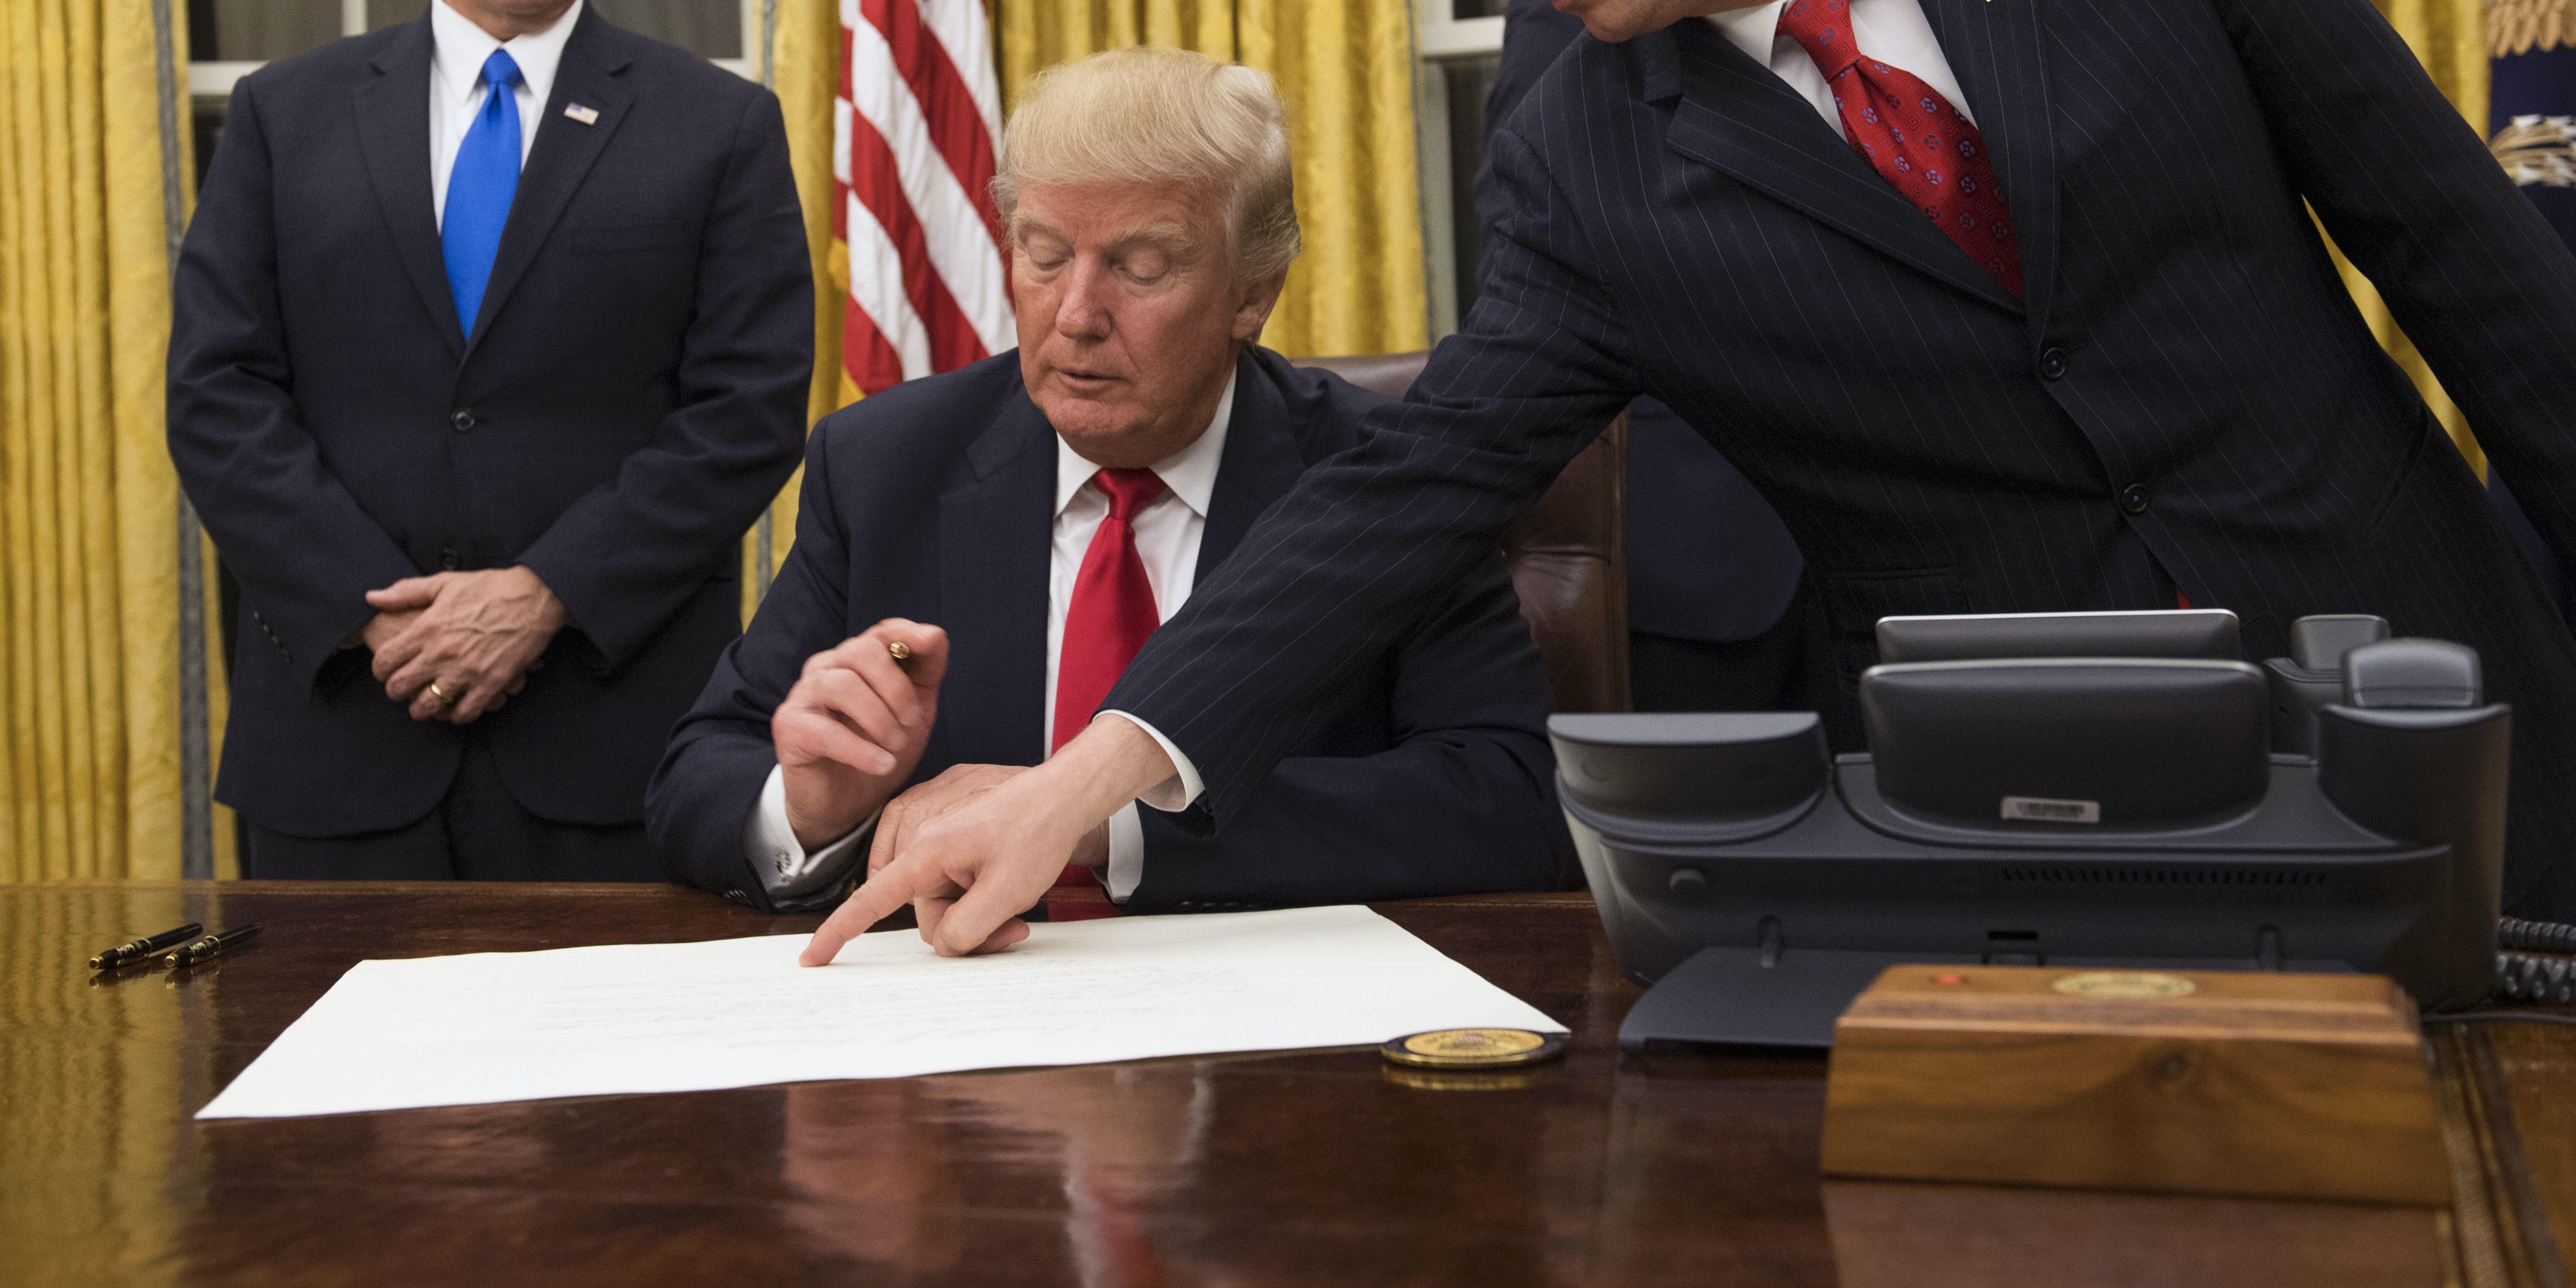 Trump signing executive orders